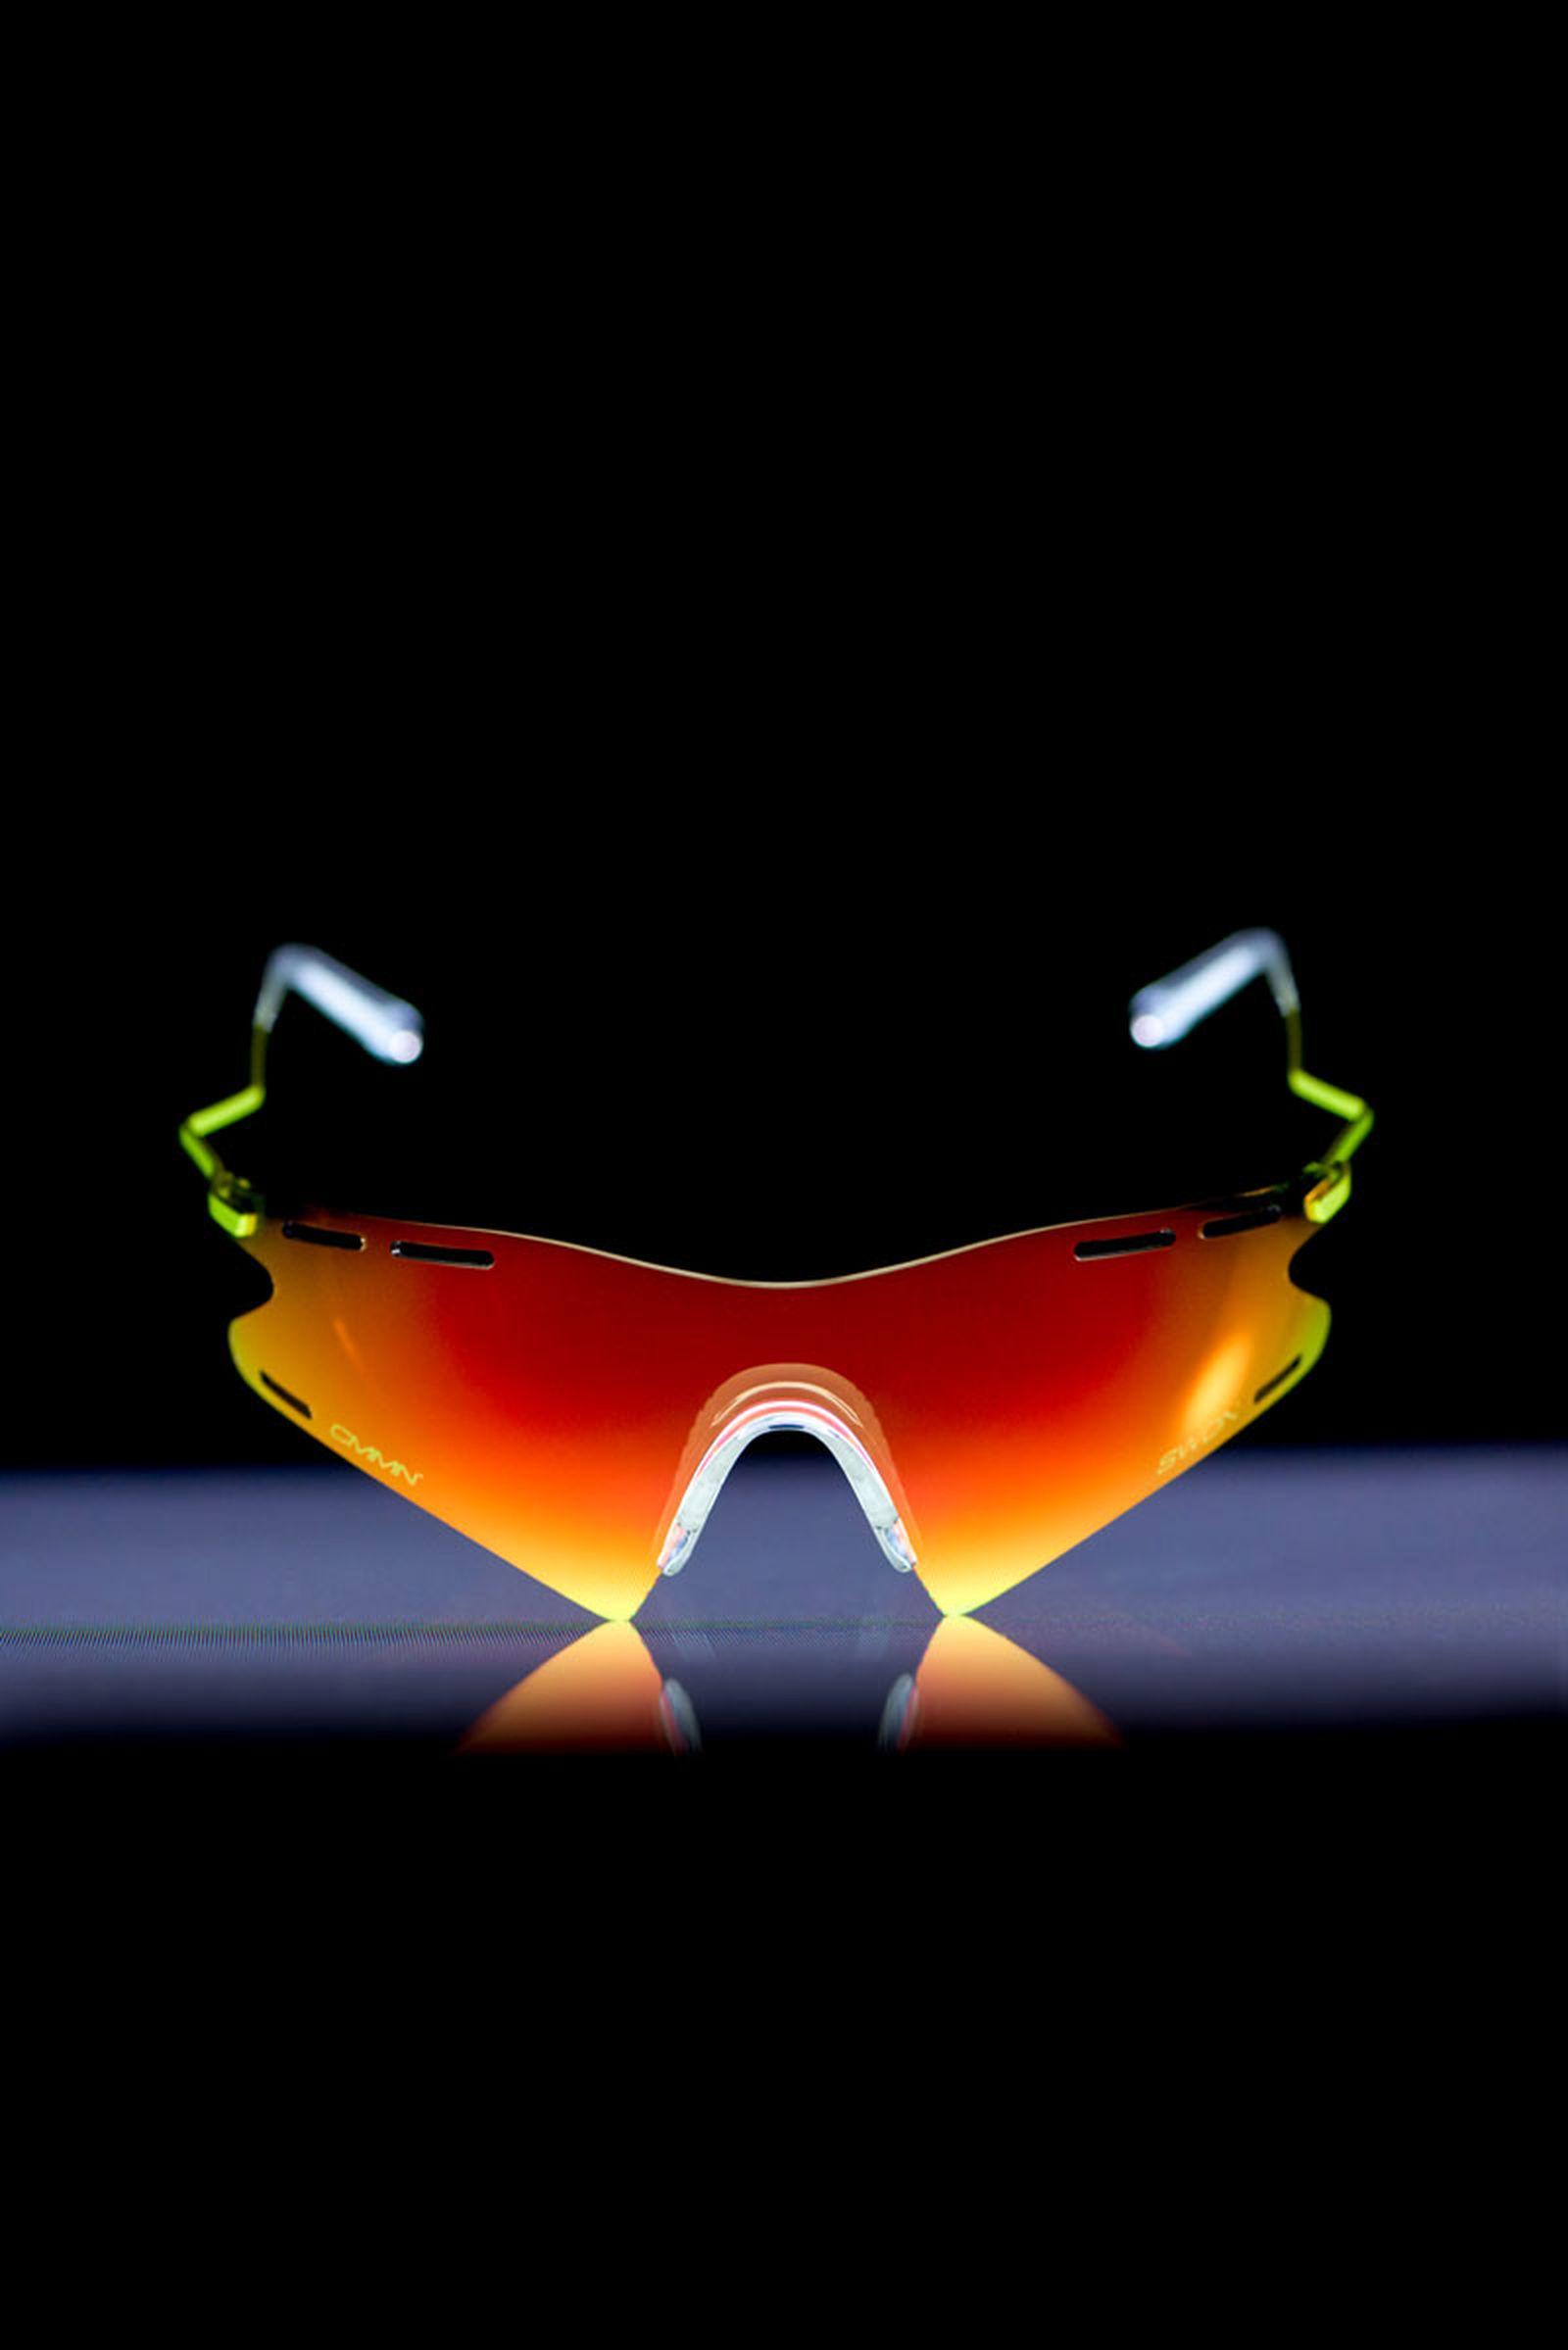 9cmmn swdn sunglasses ss19 Ace & Tate